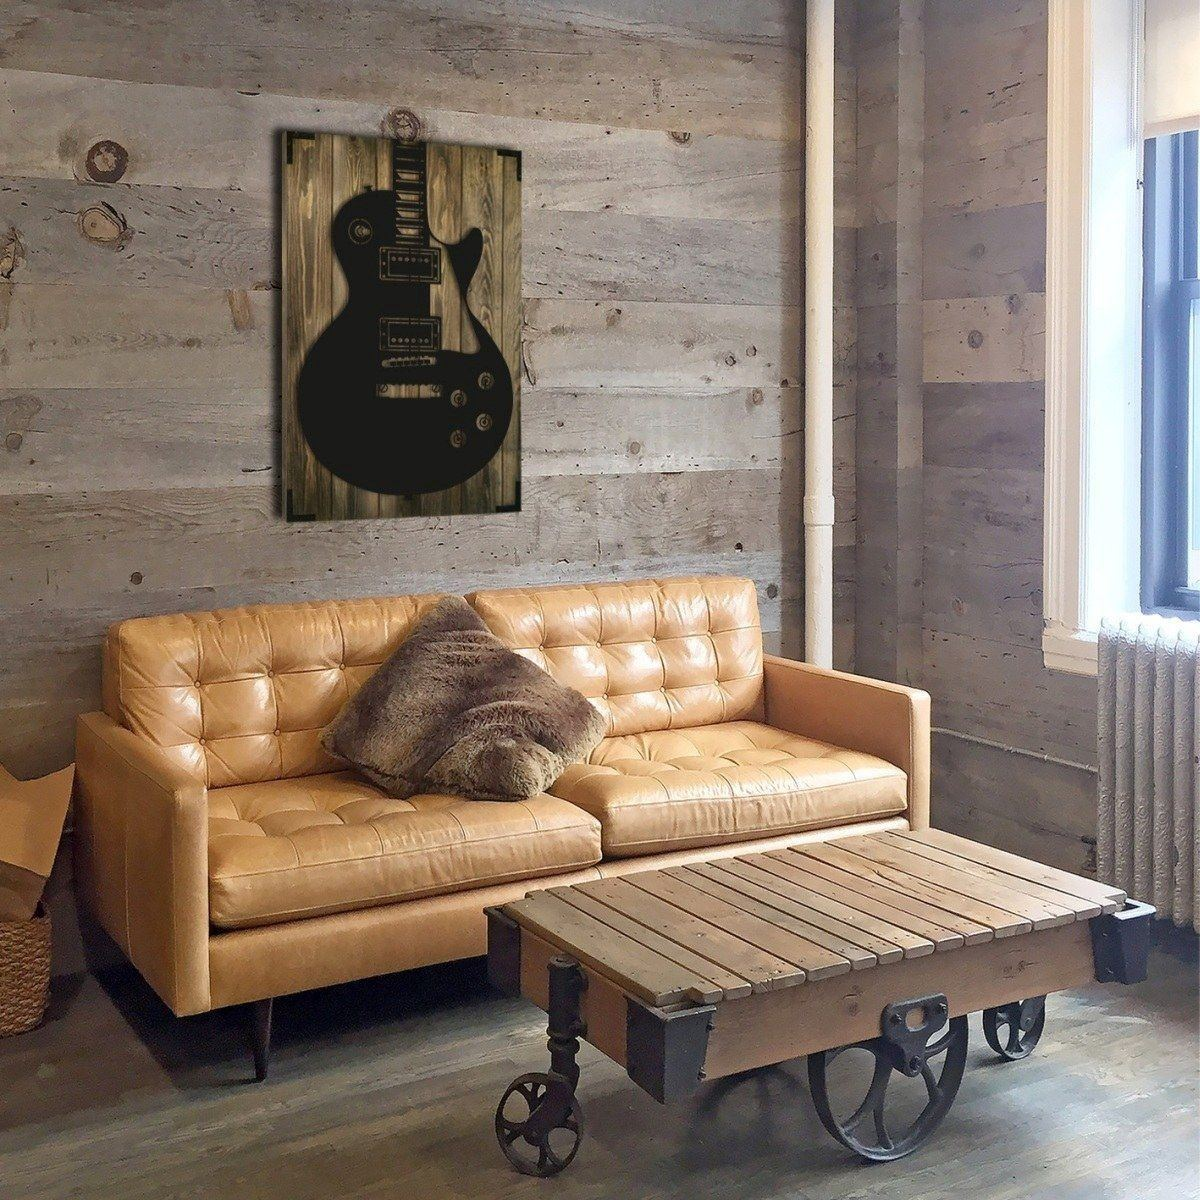 Full Size of Wohnzimmer Wandbild E Gitarre Moderne Wandbilder Schrank Relaxliege Beleuchtung Deckenleuchte Teppich Tisch Dekoration Indirekte Led Tapeten Ideen Heizkörper Wohnzimmer Wohnzimmer Wandbild